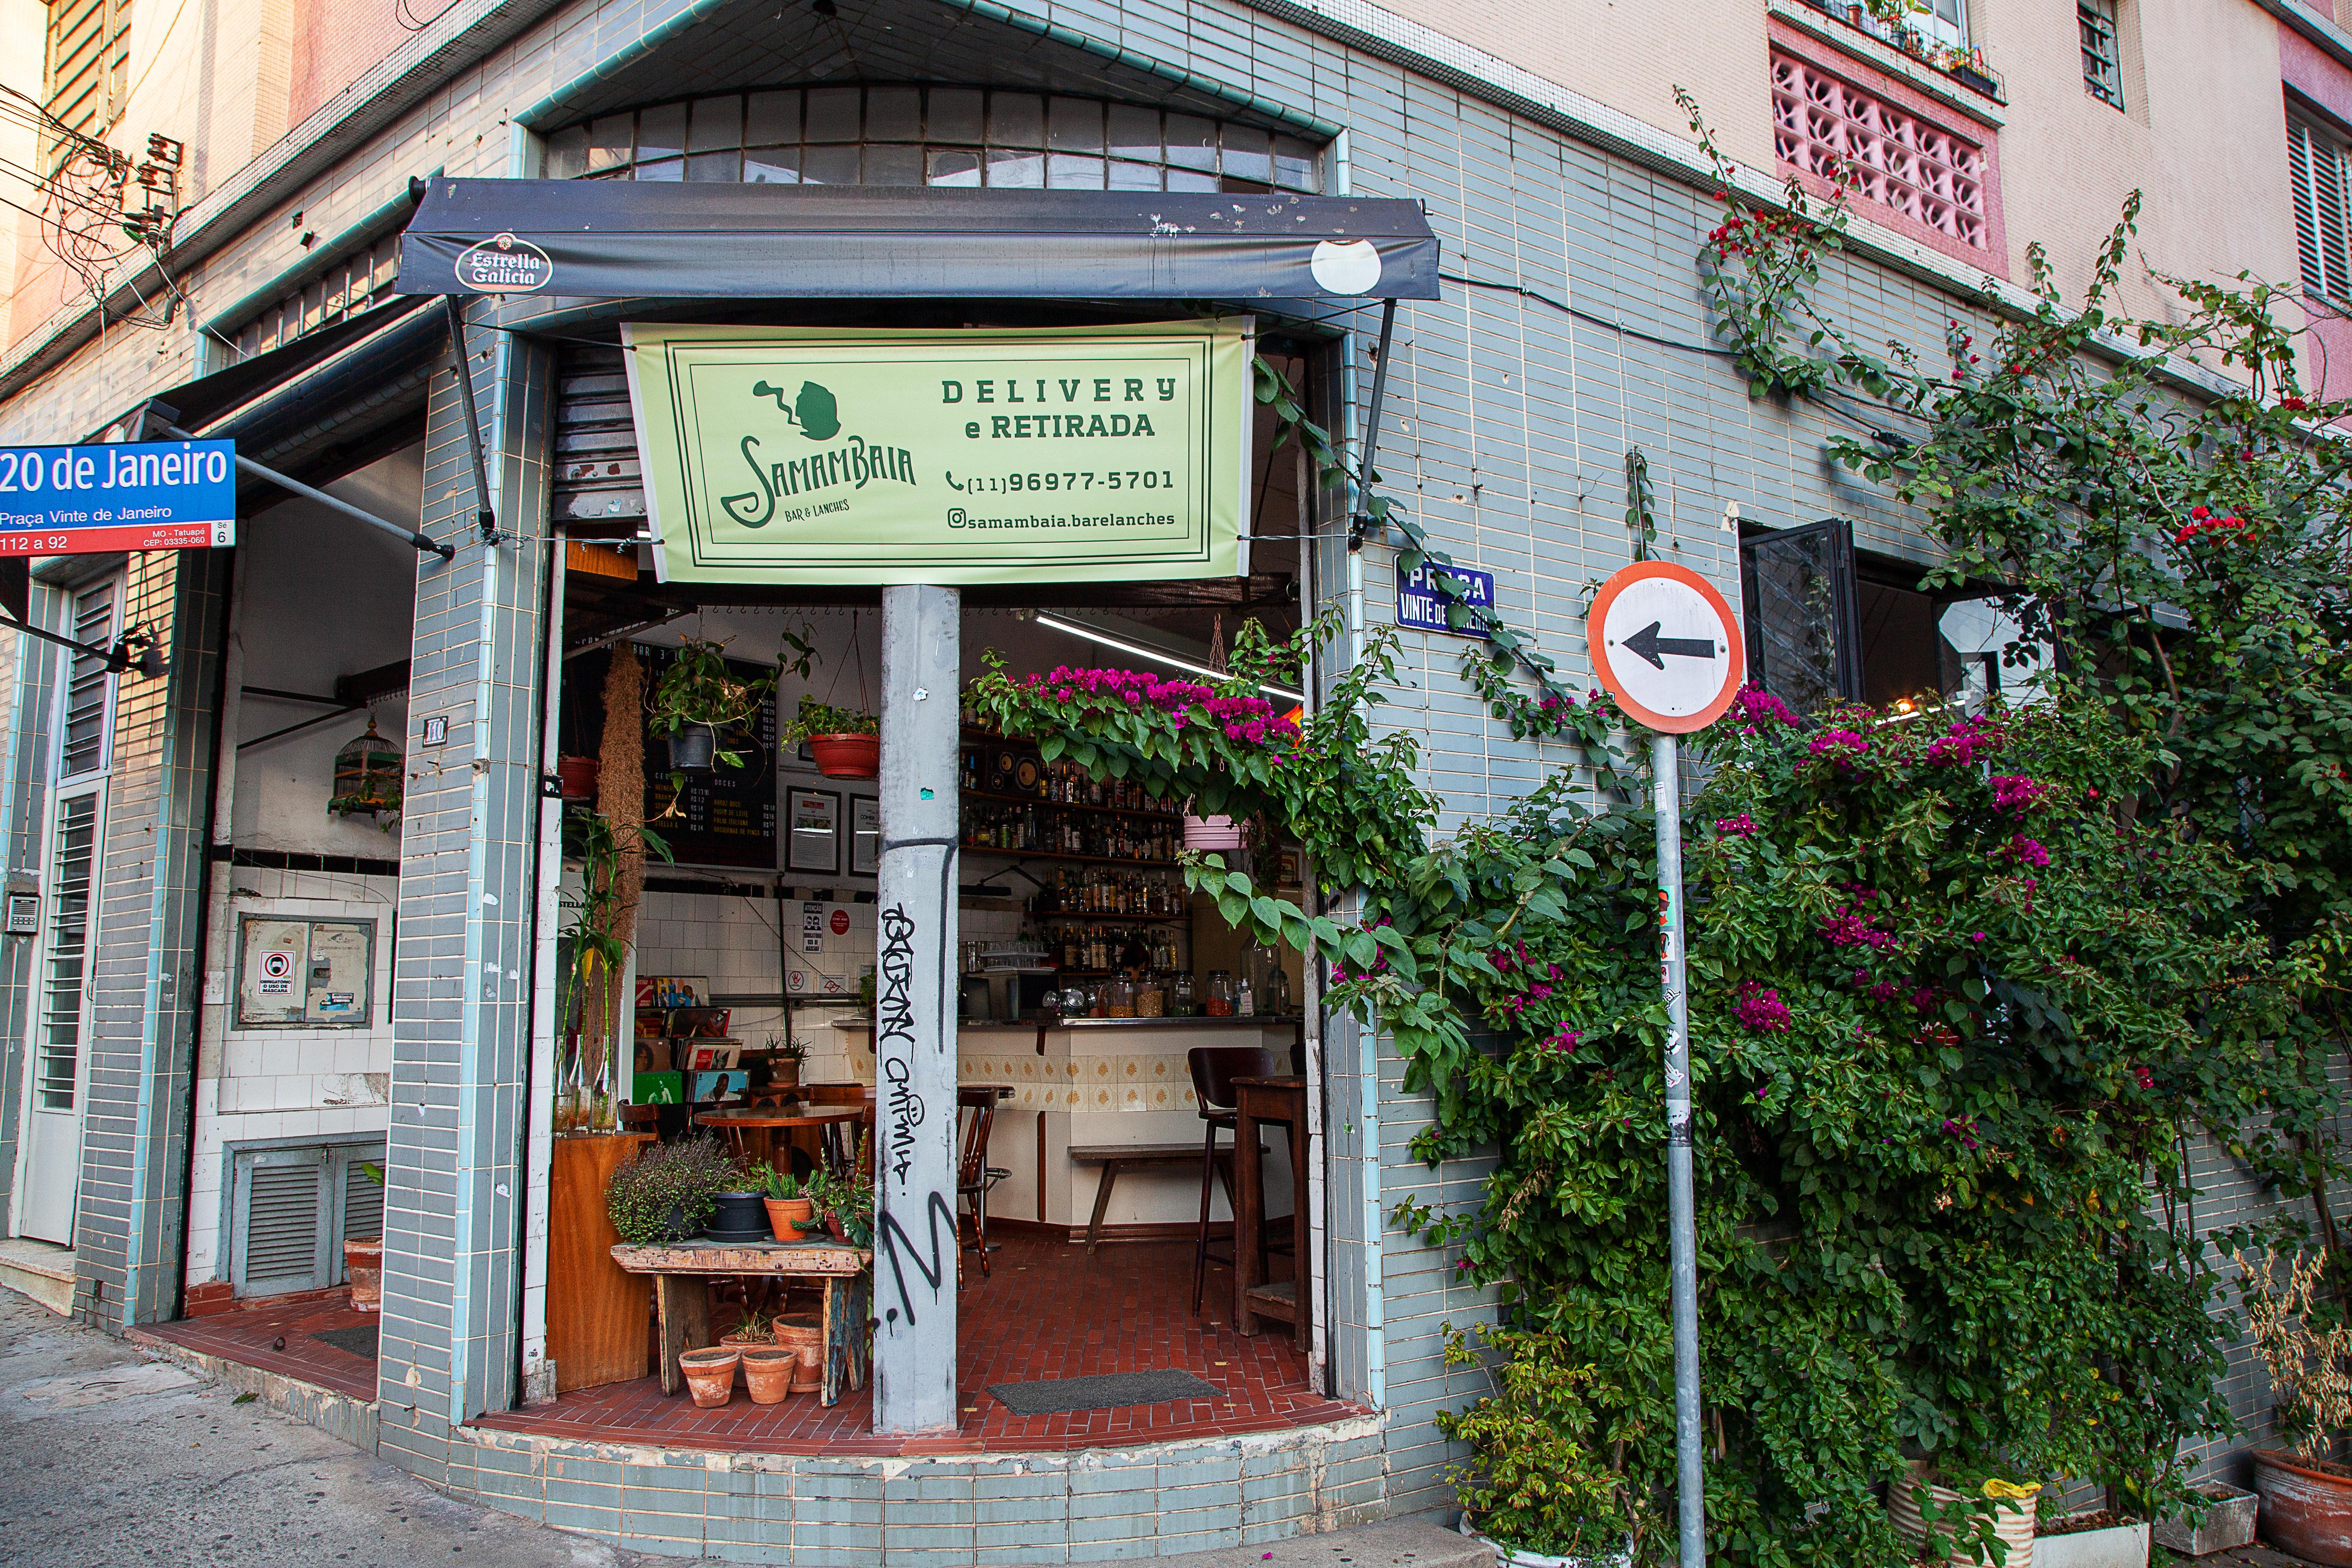 Fachada do Samambaia Bar e Lanhes.